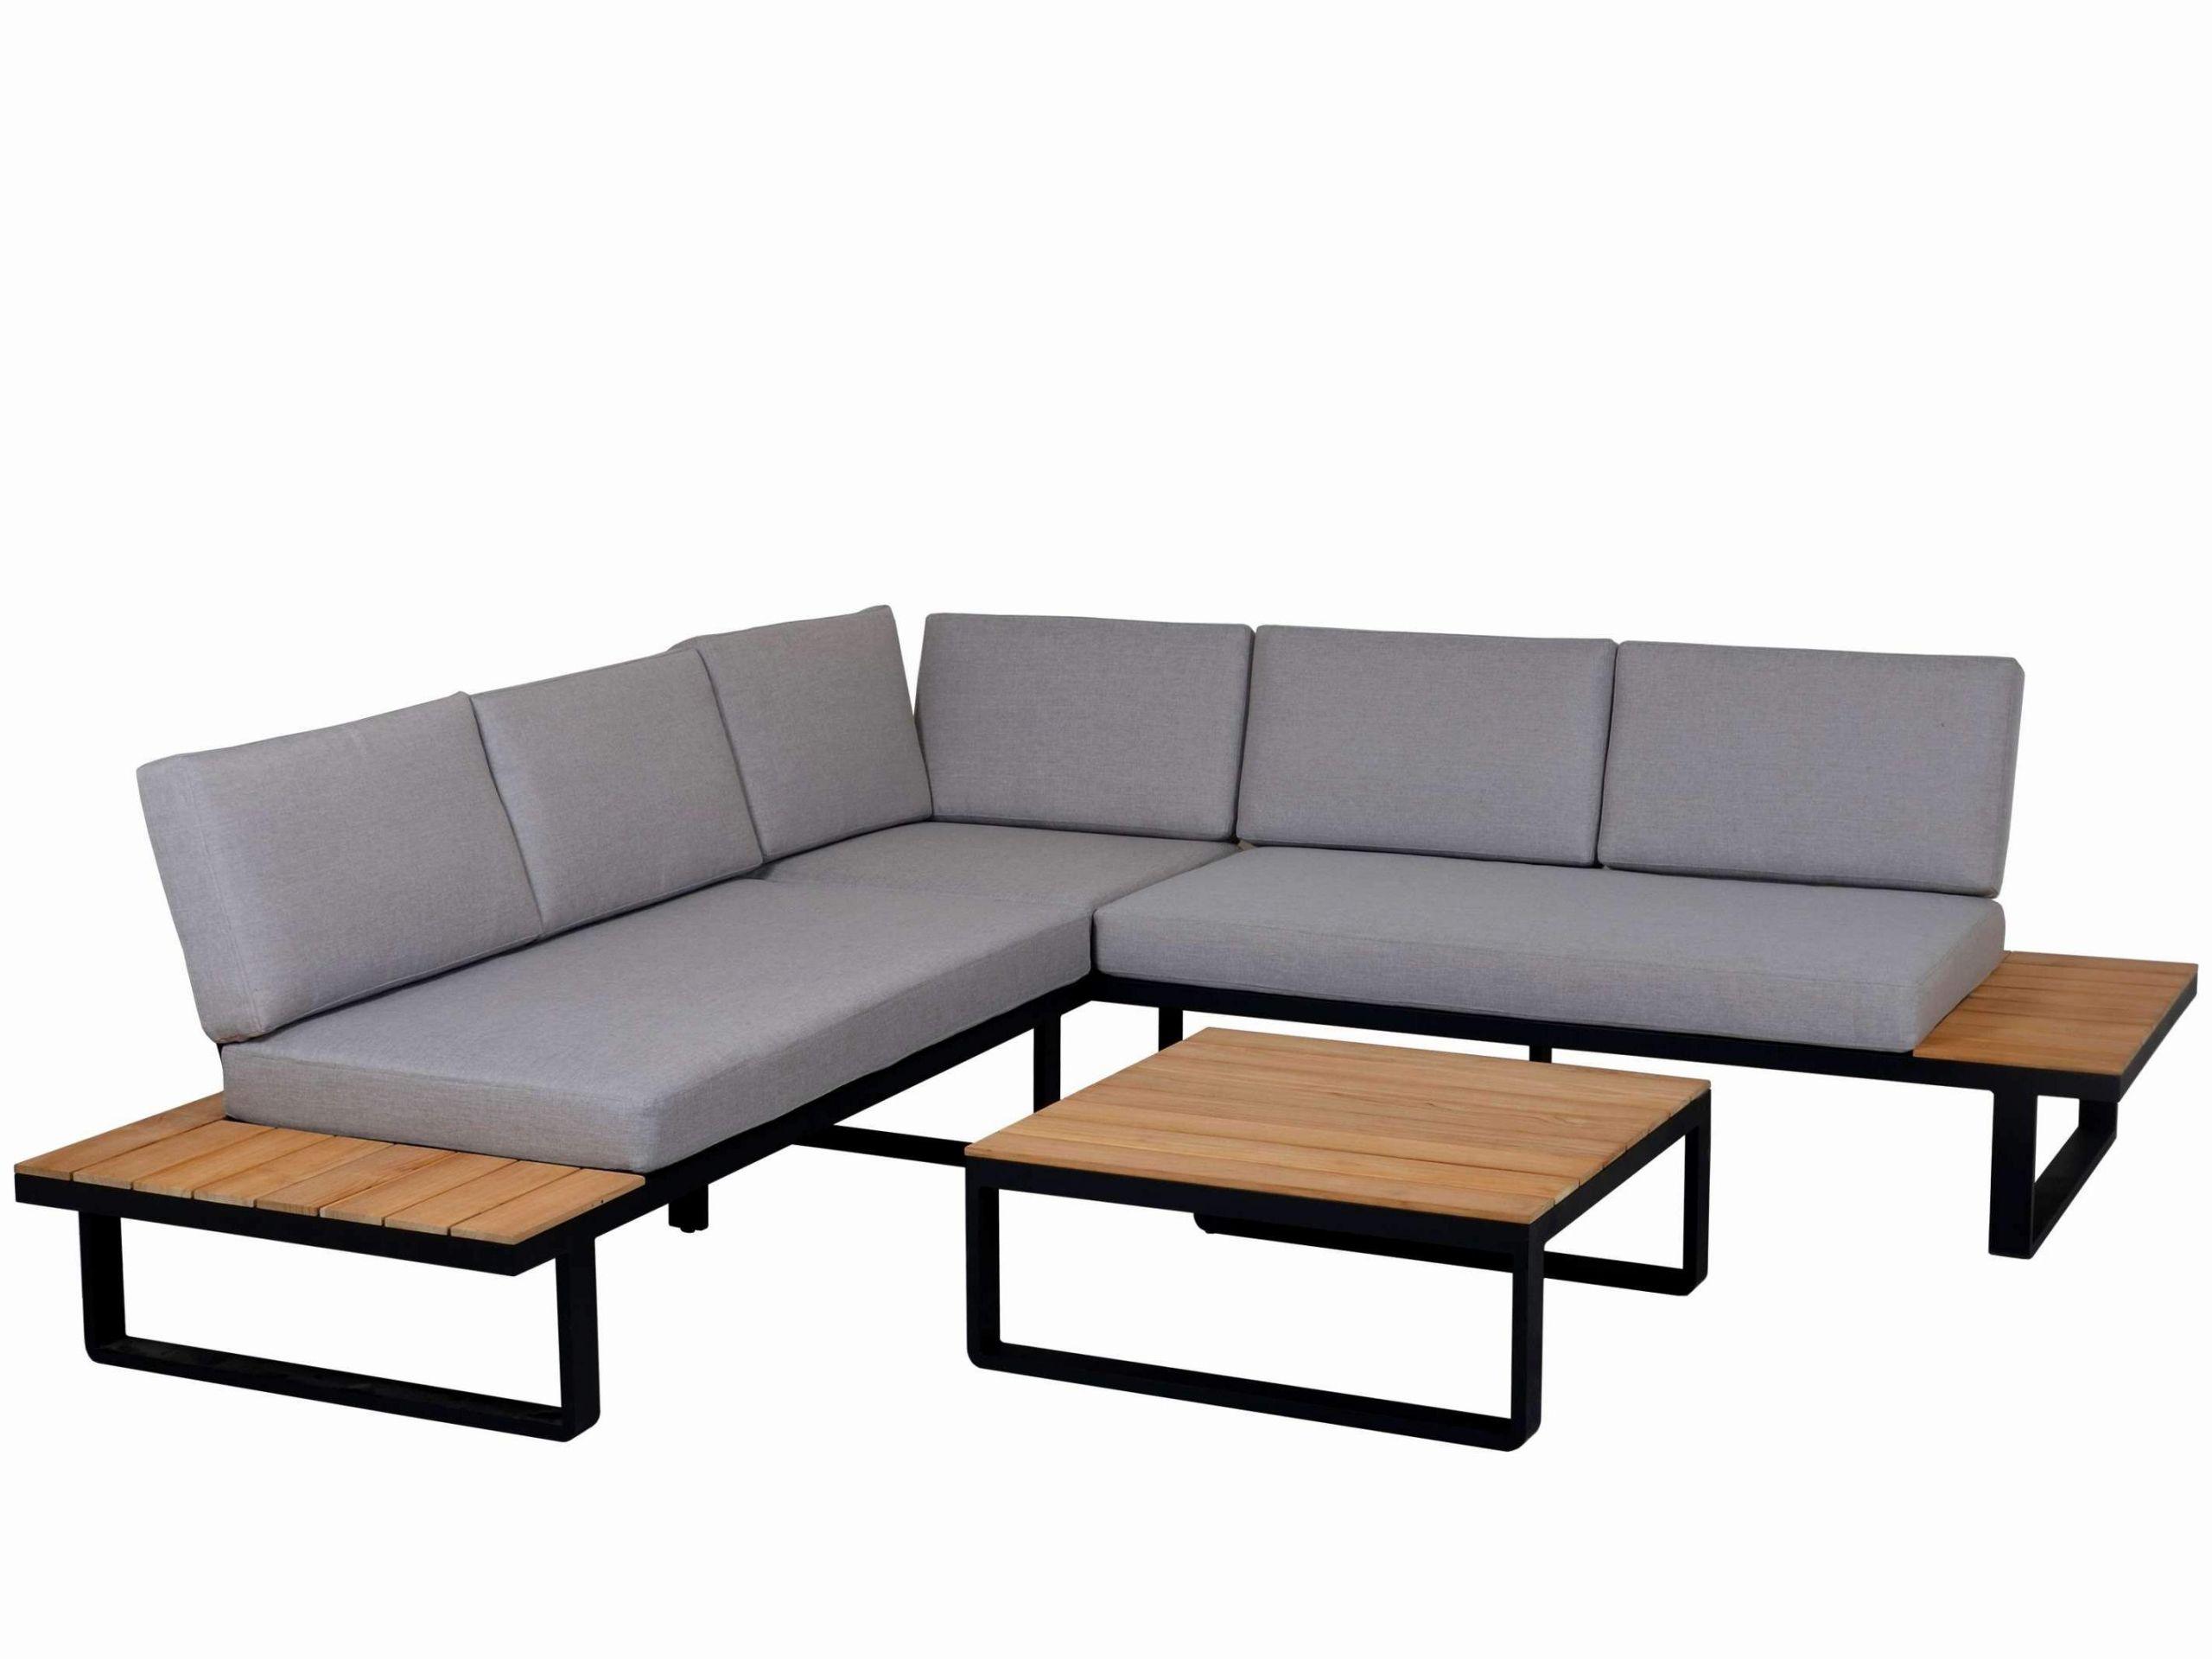 Lounge Ecksofa Garten Neu 42 Von Loungesessel Polyrattan Ideen